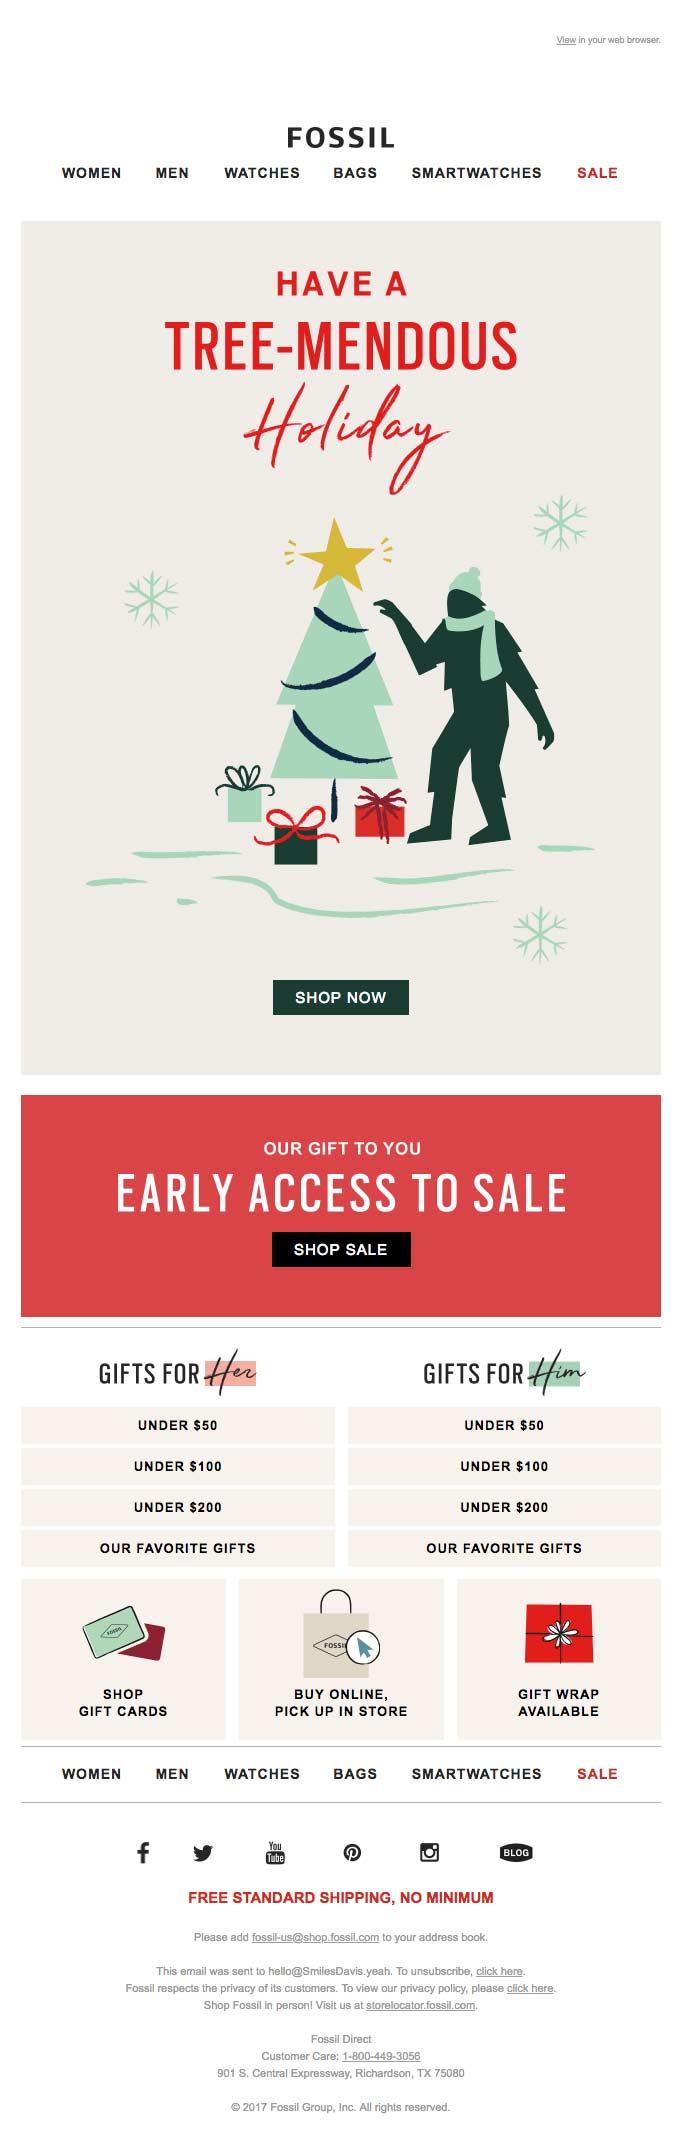 Heavily designed e-commerce email for a frashion brand